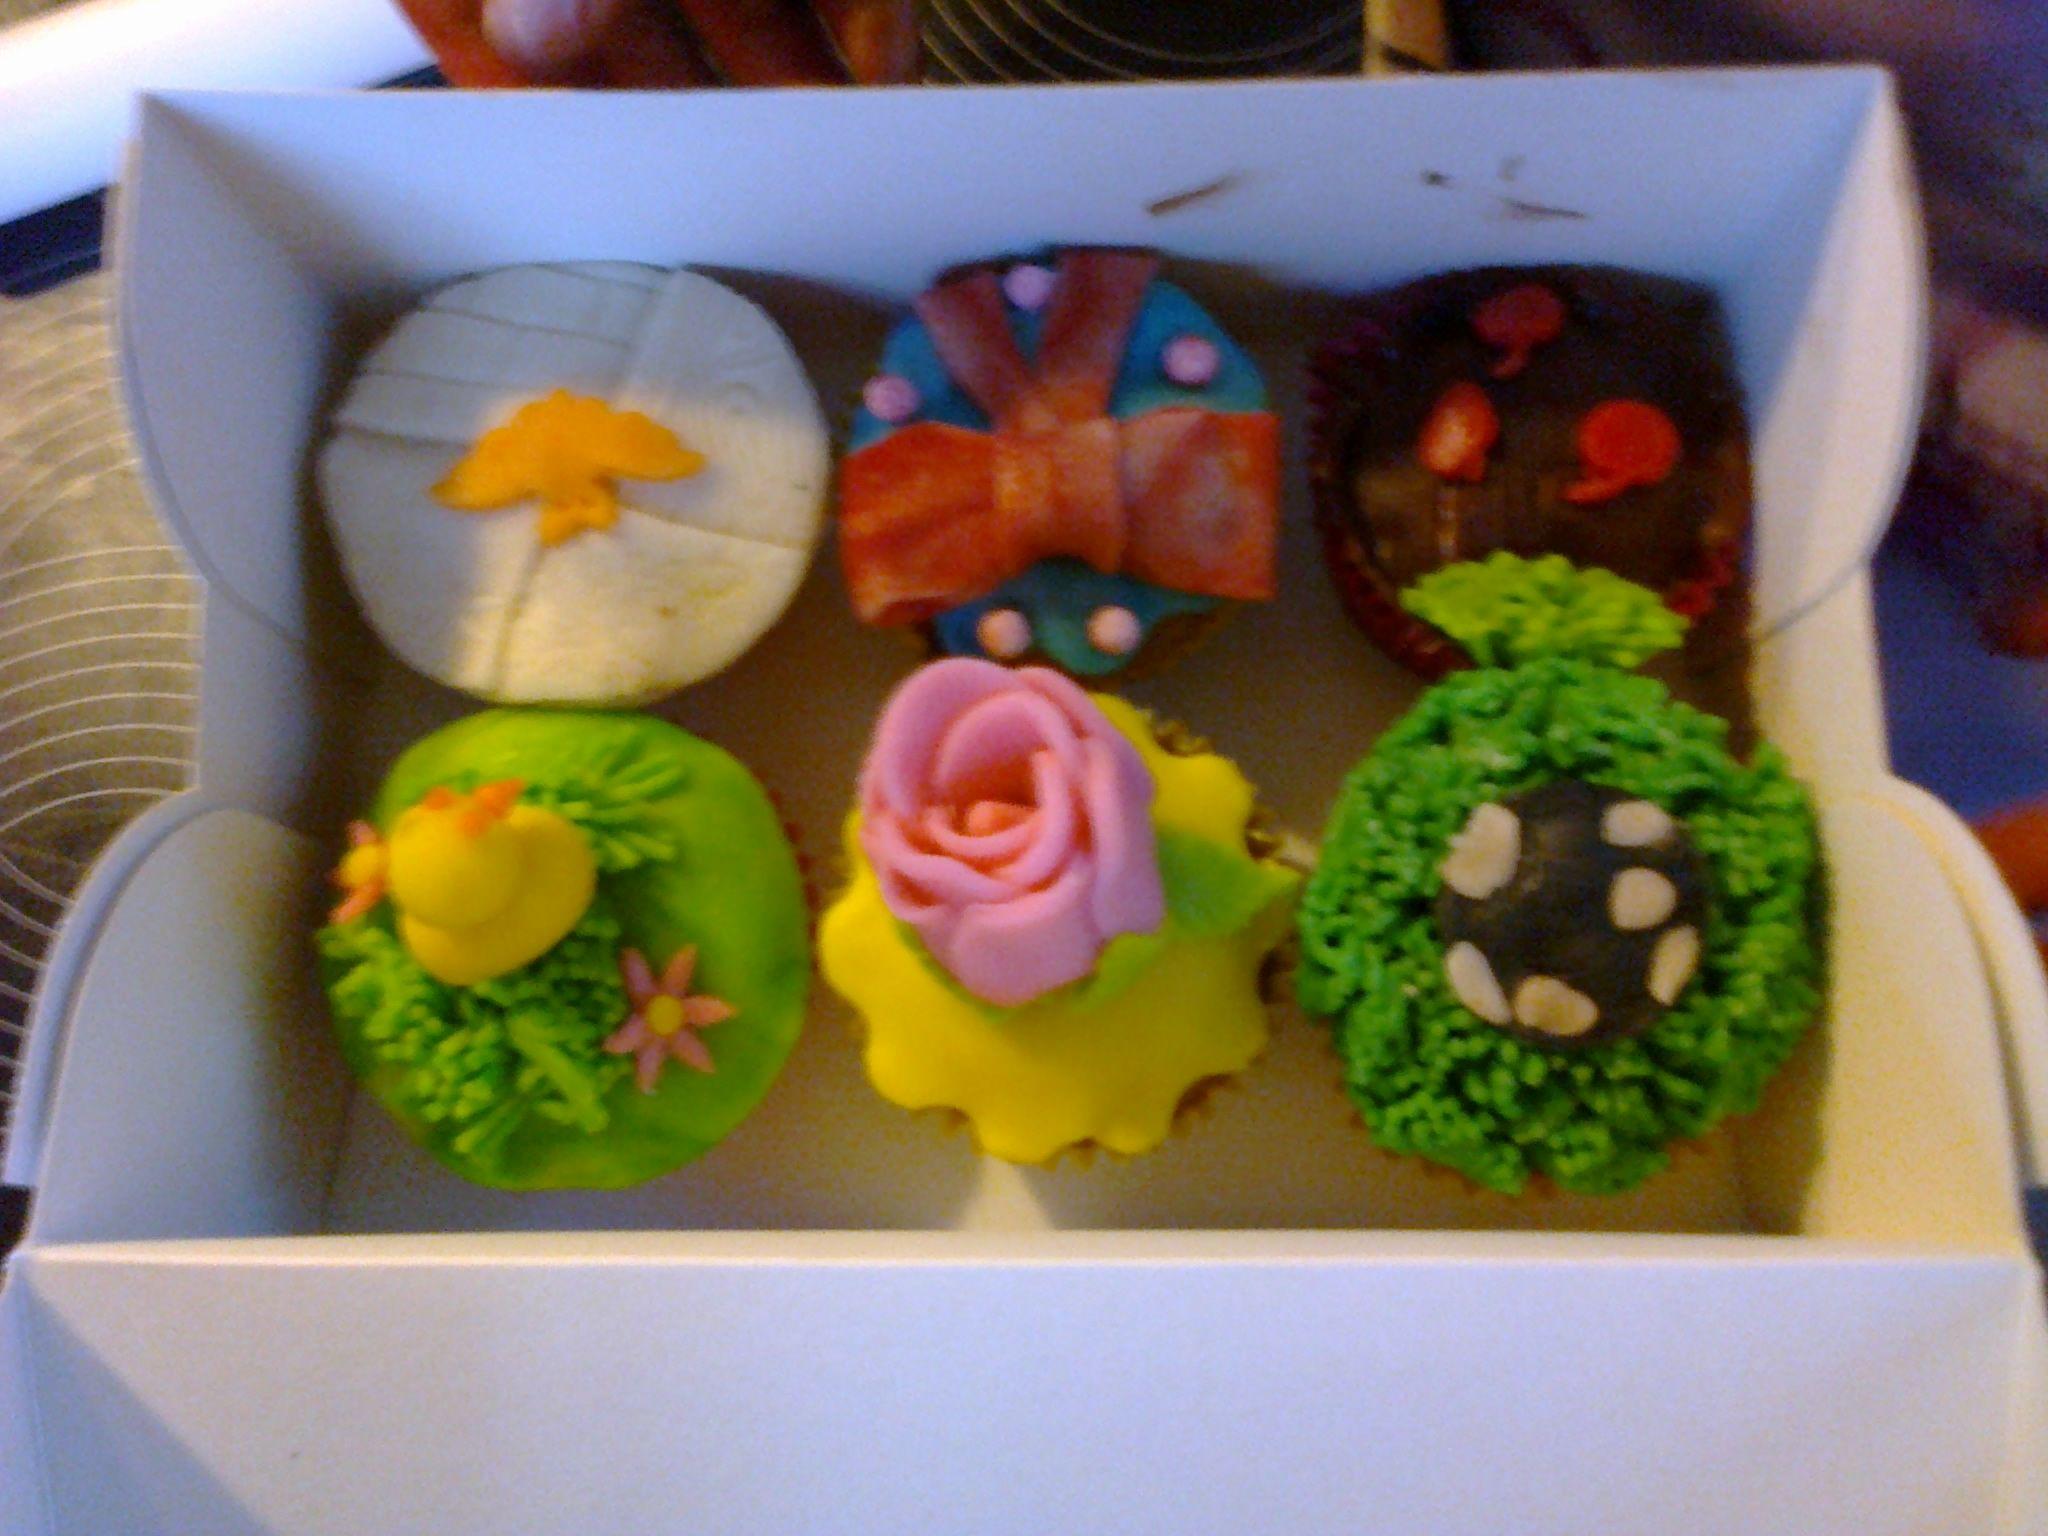 resultaat kinderfeestje cupcake versieren cupcakes. Black Bedroom Furniture Sets. Home Design Ideas